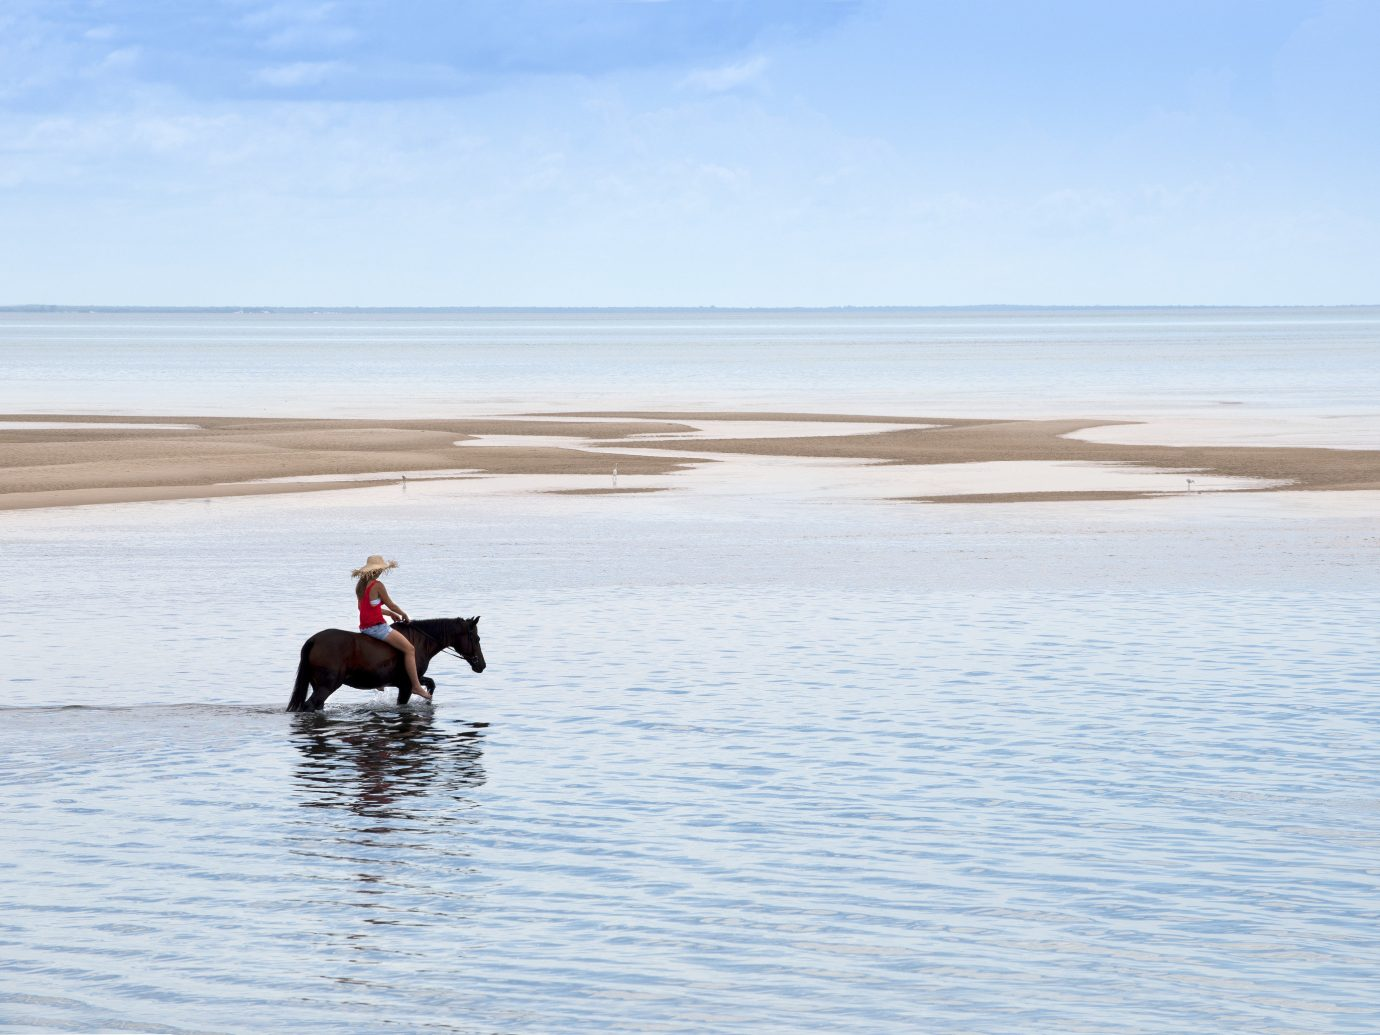 Trip Ideas water outdoor sky Dog shore Sea body of water horizon Beach Ocean Coast vacation Lake bay sand swimming